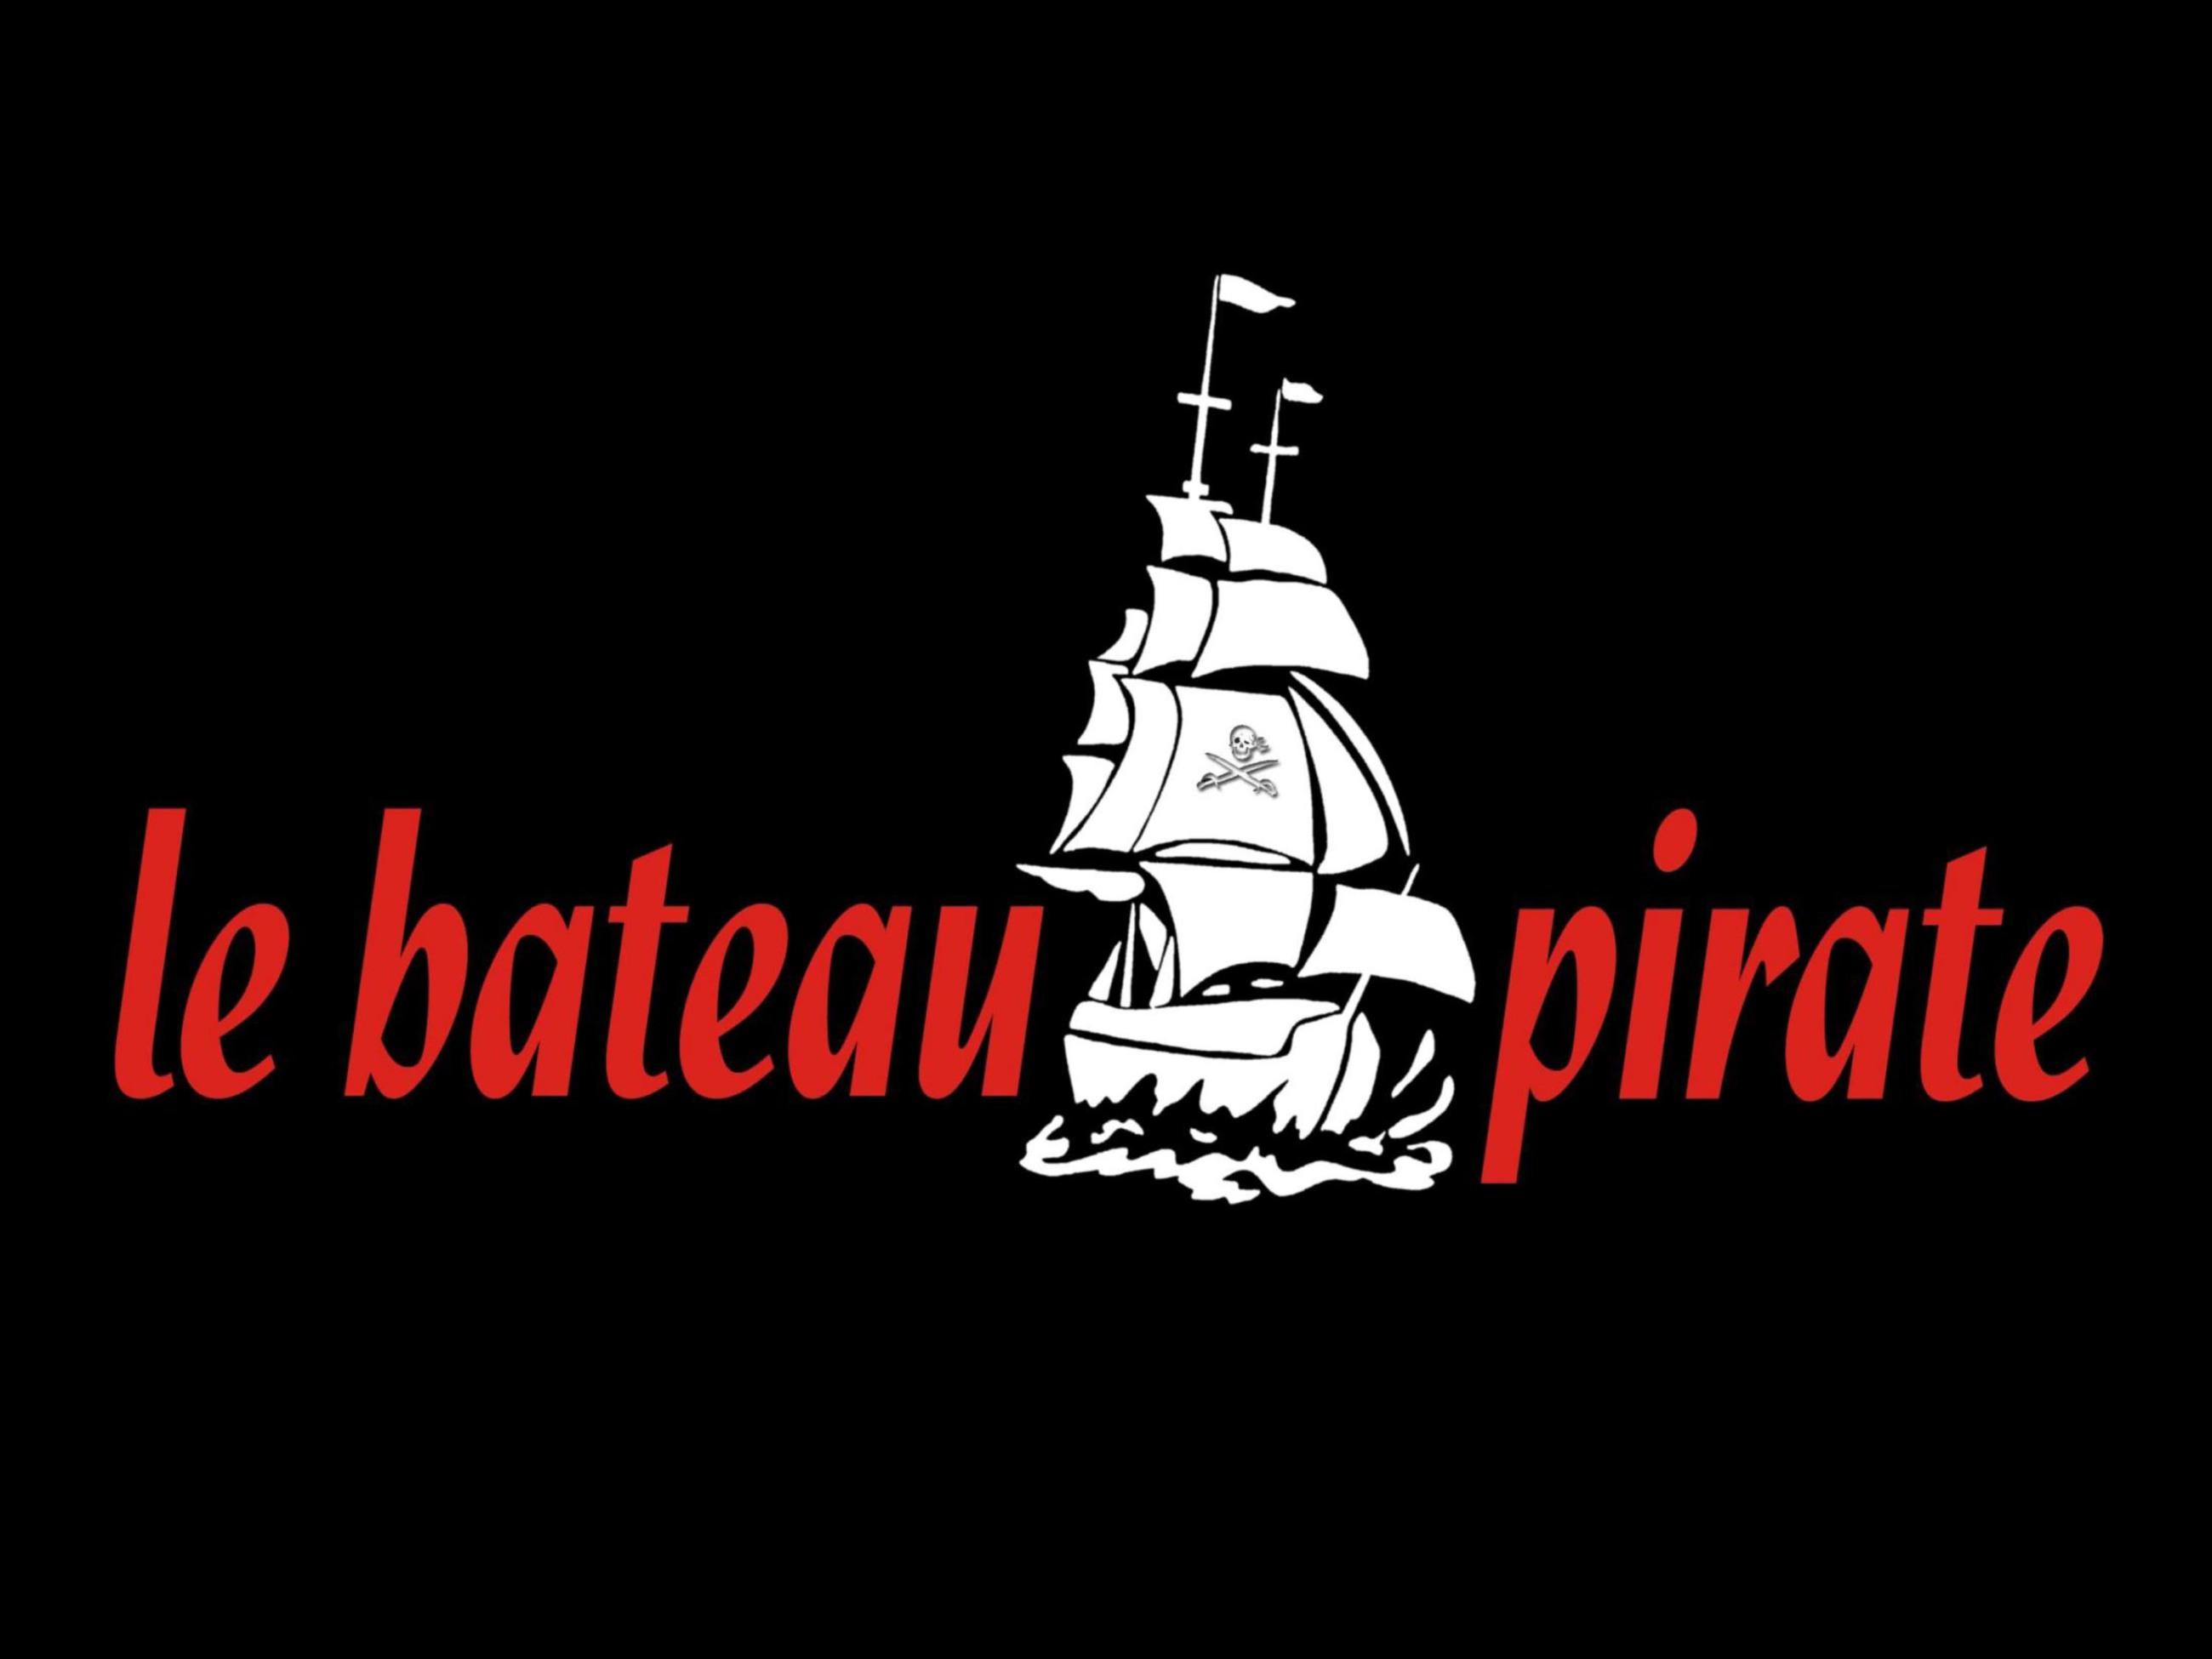 bateau pirate, animation pirate, animation enfant, animation pirate enfant, anniversaire pirate, parc d'aventure